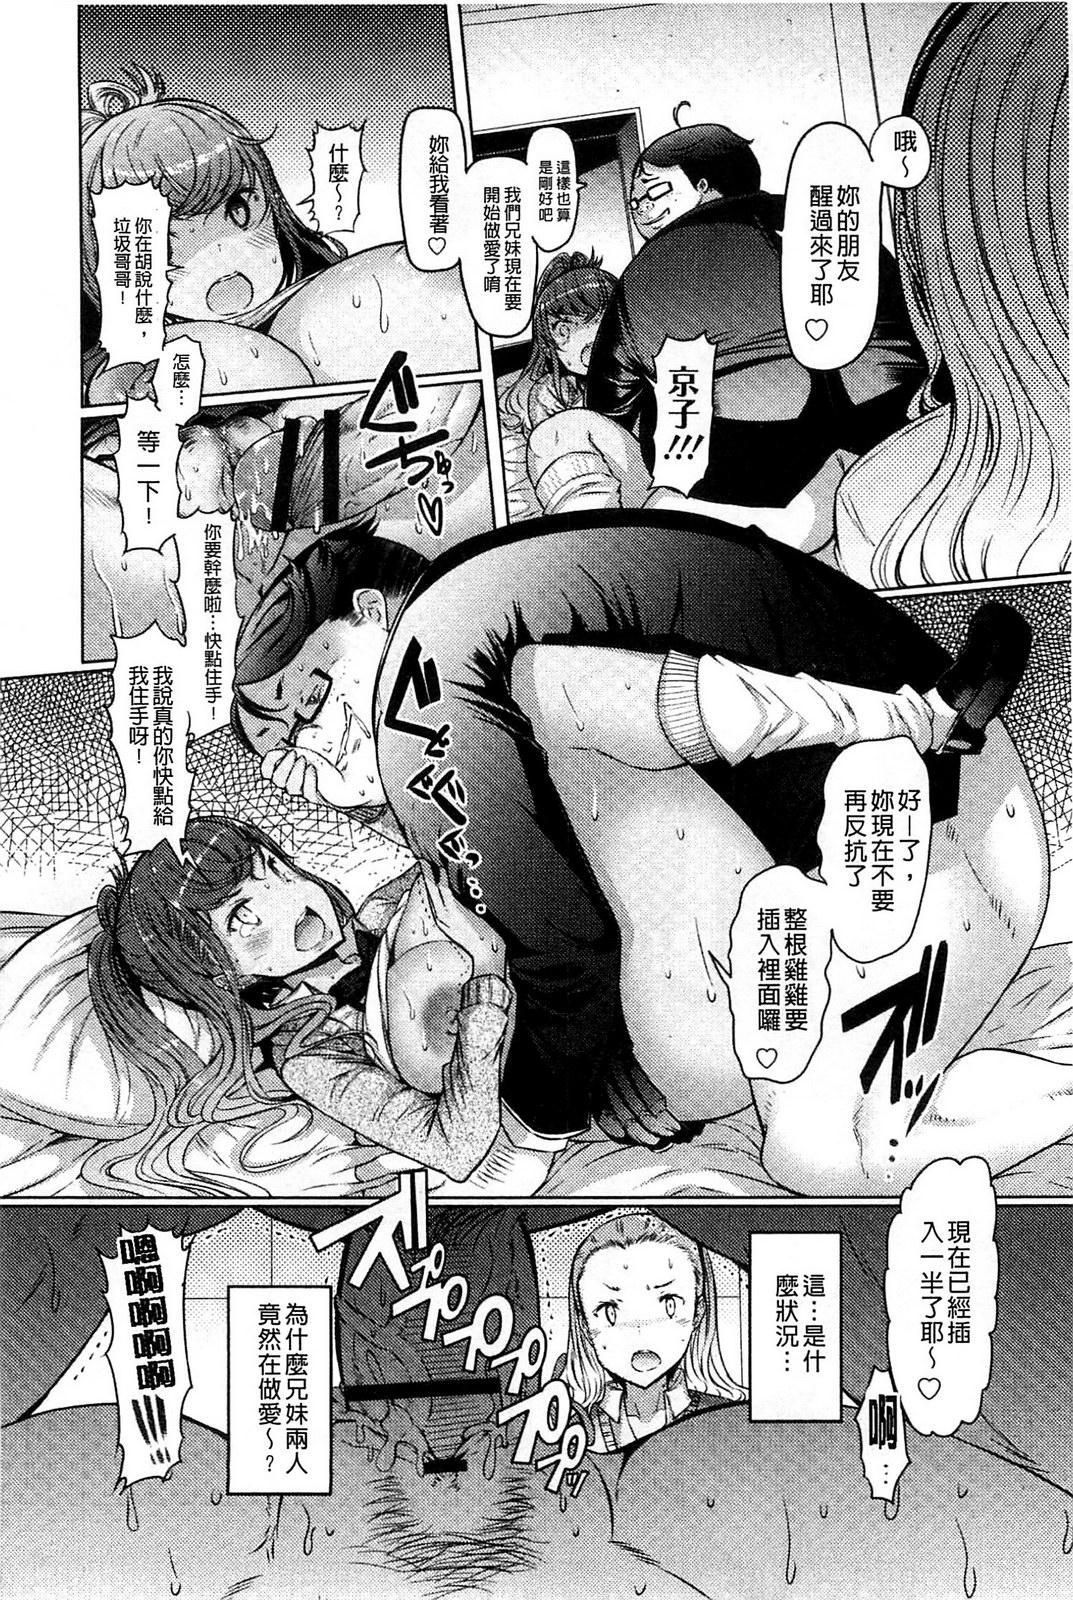 Imouto Kansatsu Nikki - The Record of Sex with My Sister 78